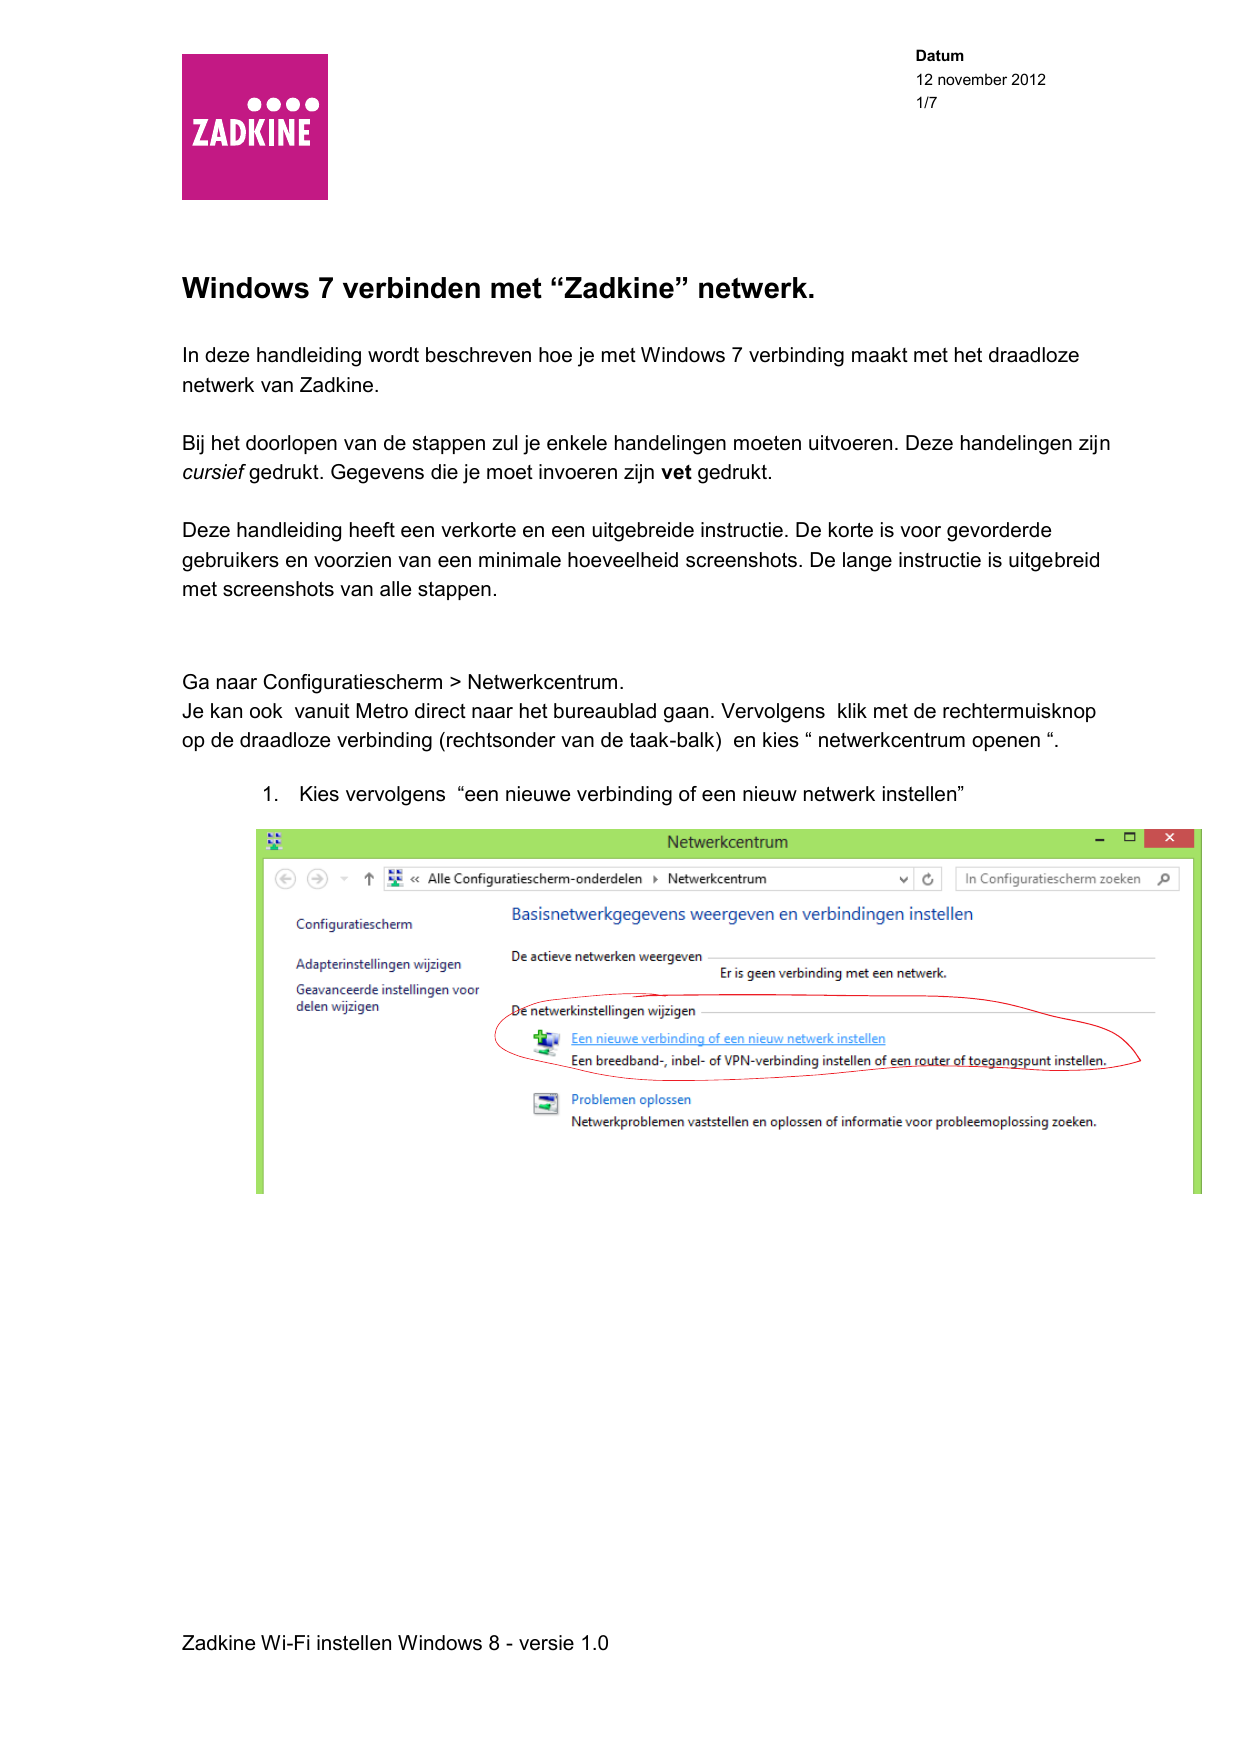 Zadkine Wi Fi Instellen Windows 8 V10